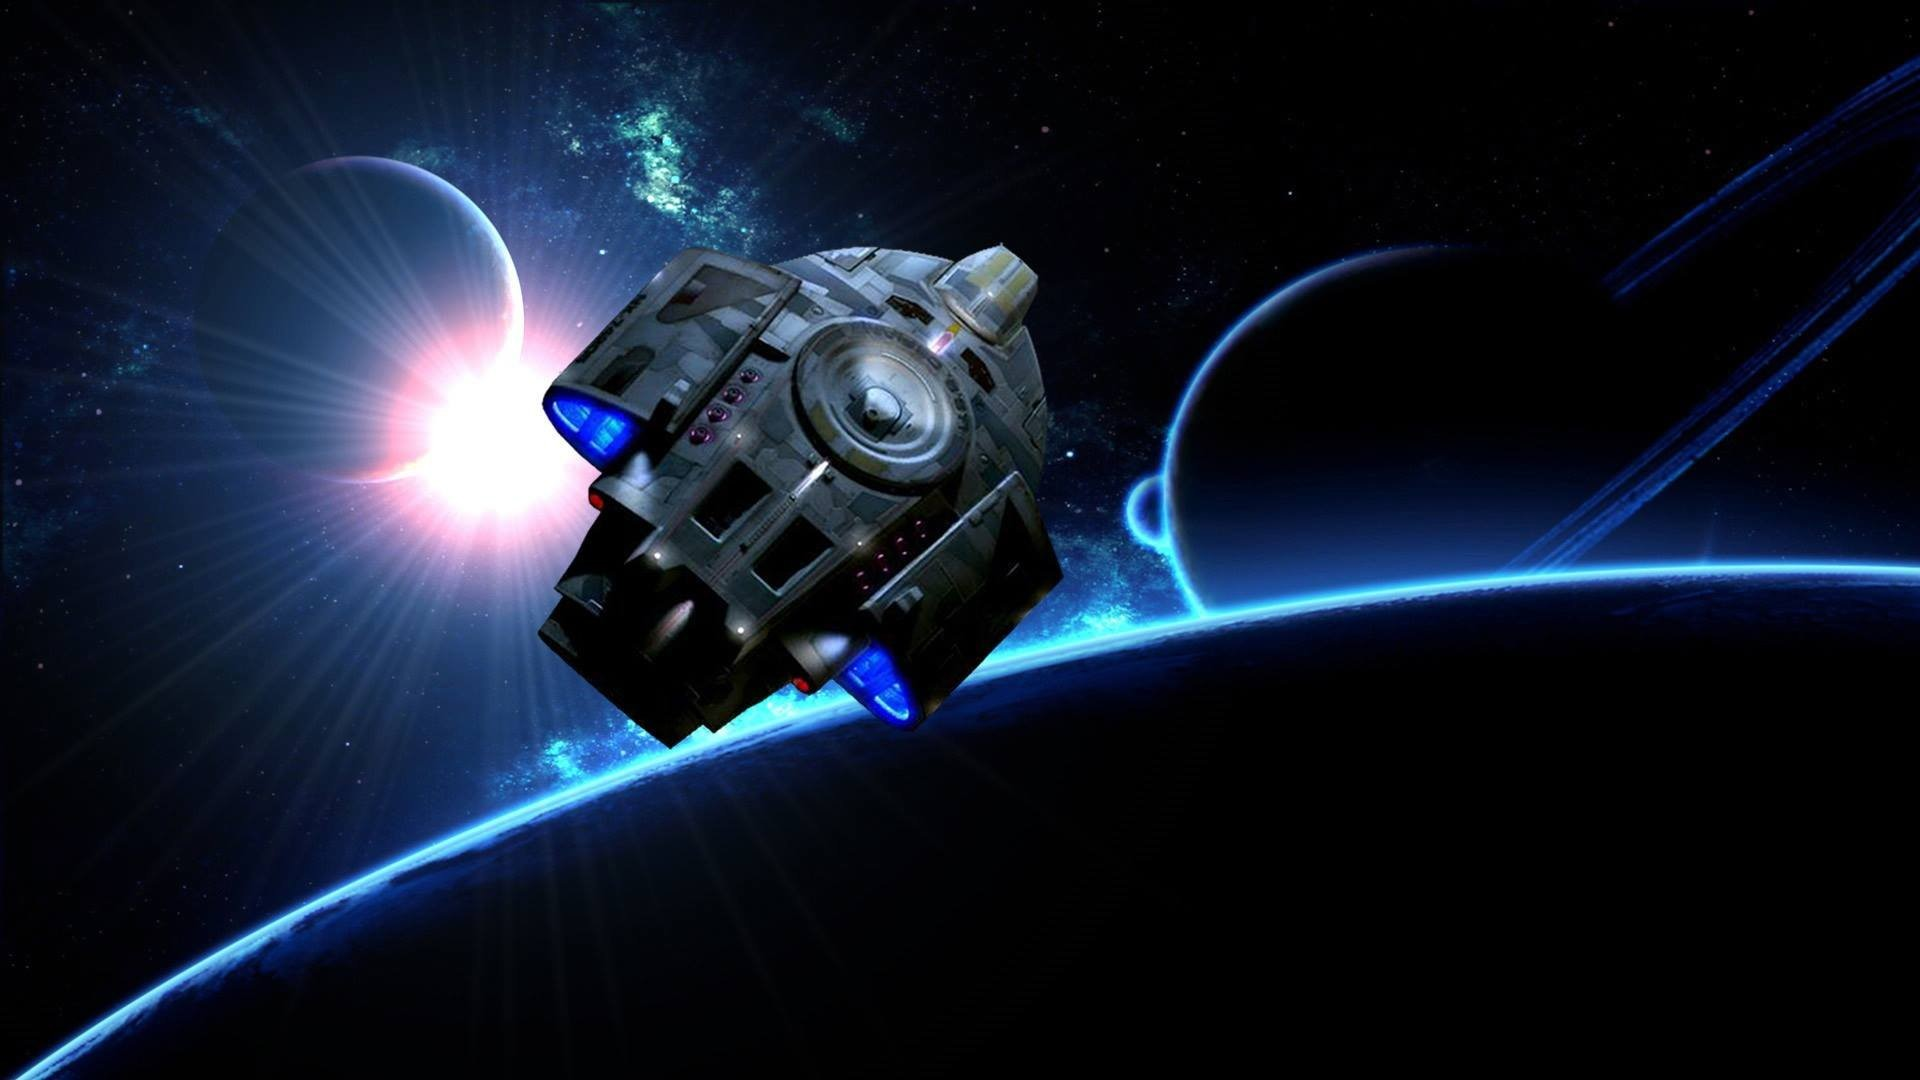 Star Trek Ship HD Wide Wallpaper for Widescreen (66 Wallpapers) – HD  Wallpapers